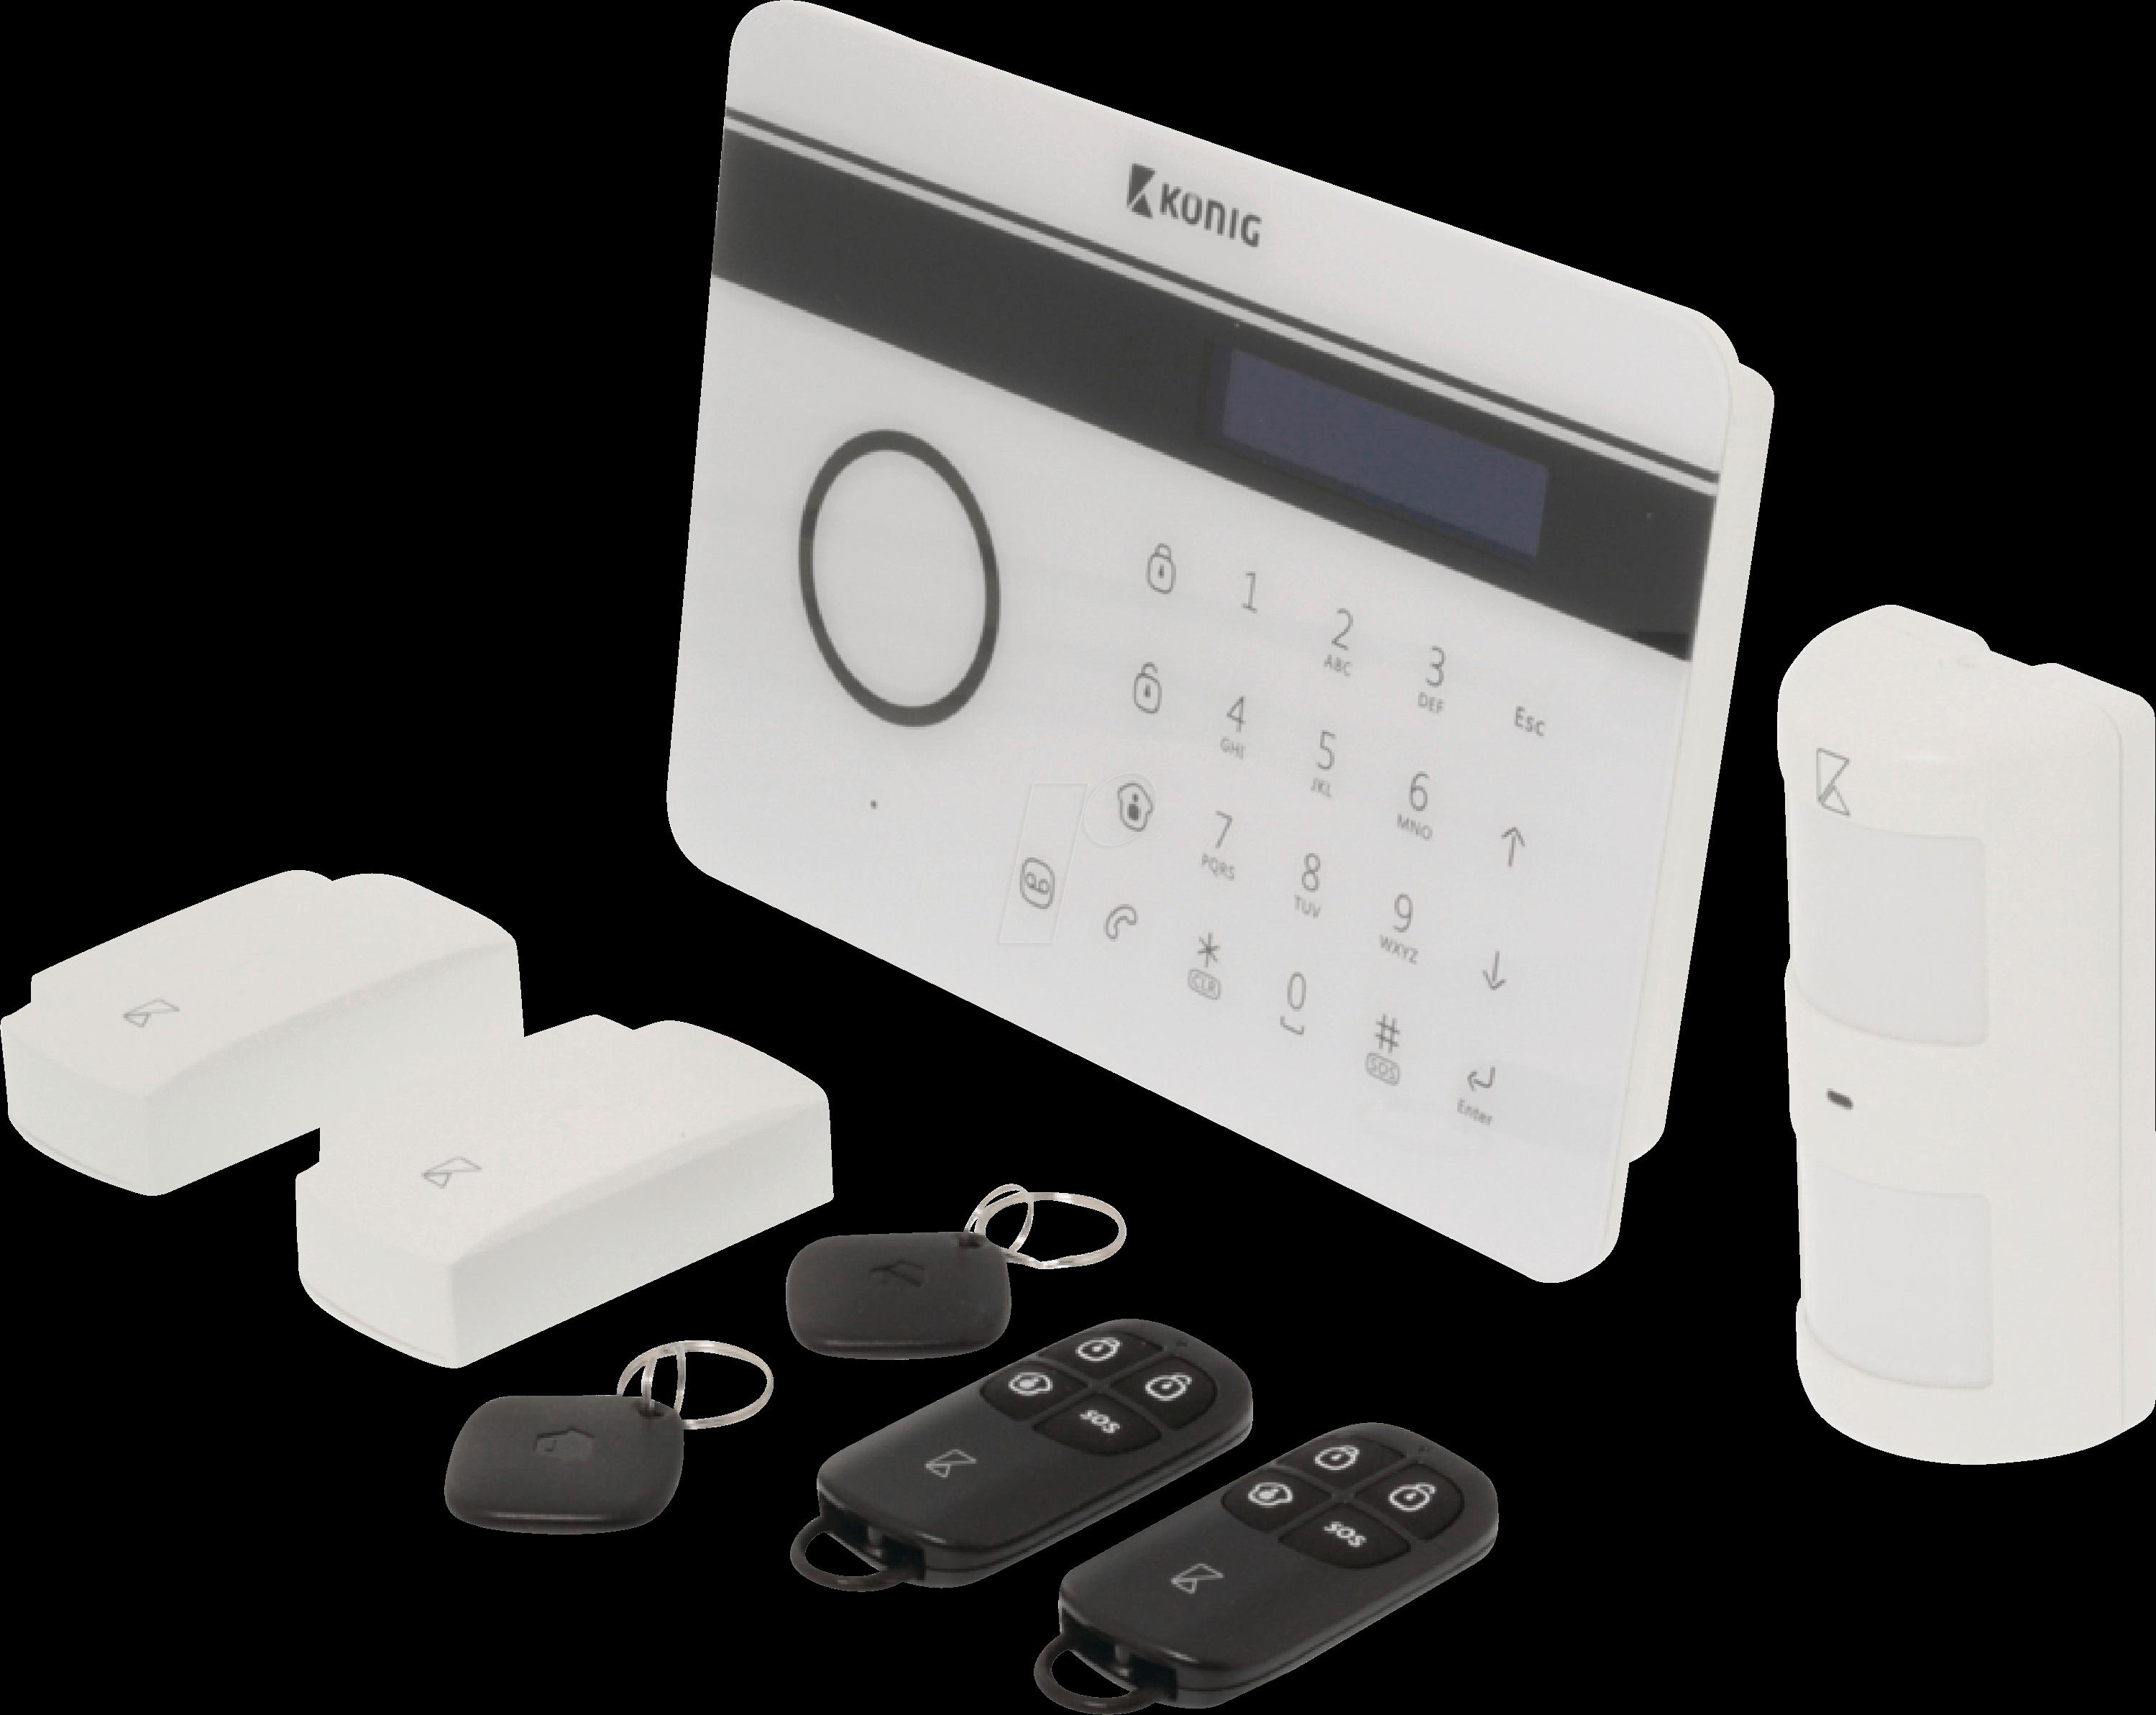 kn sas-alarm300: alarmanlage, funk 433 mhz, mit gsm modul bei